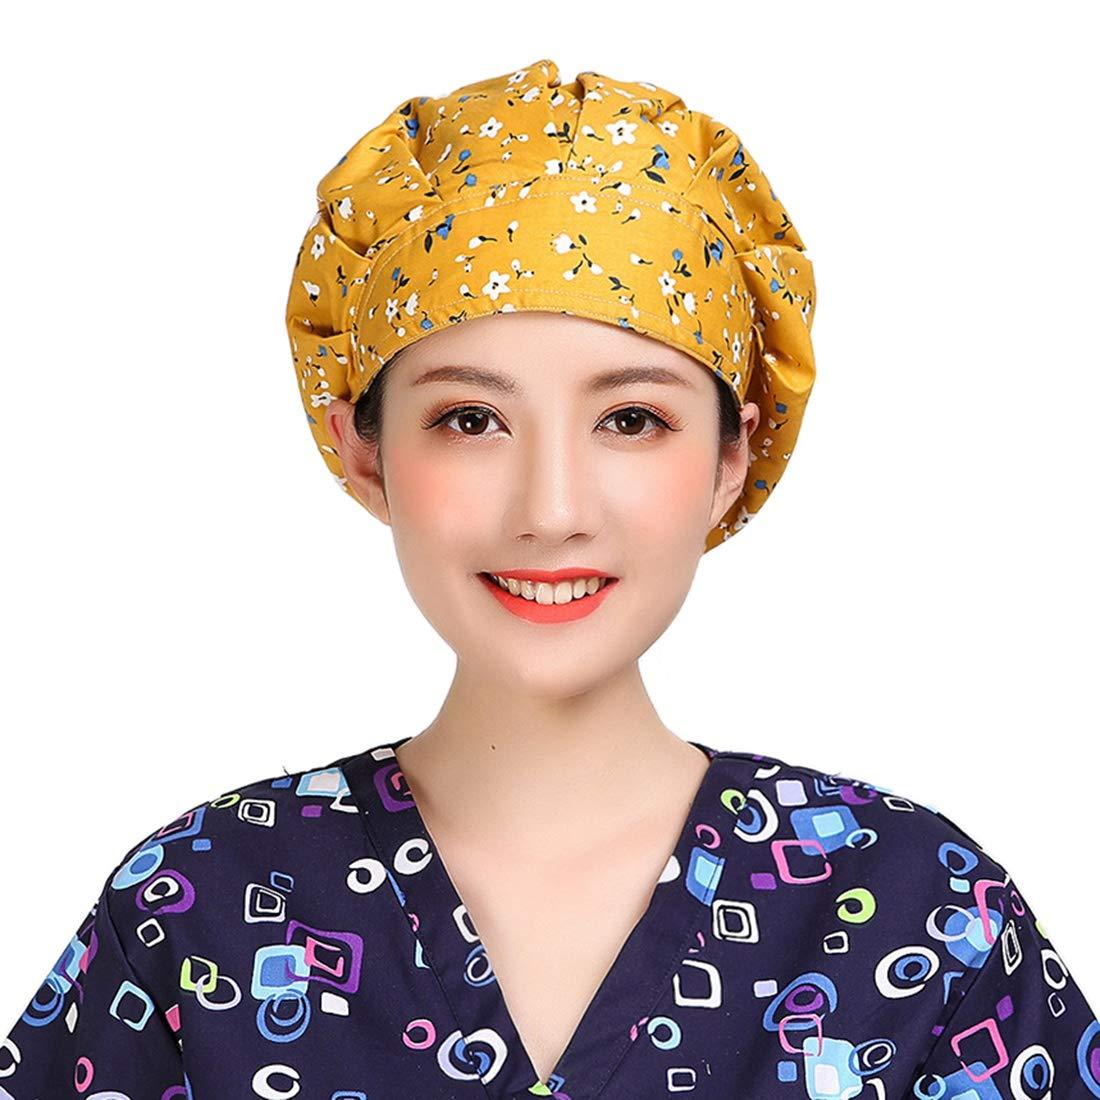 YUENA CARE Scrub Caps Surgical Cap Women Surgery Hats Nurse Doctor Sweatband Hat